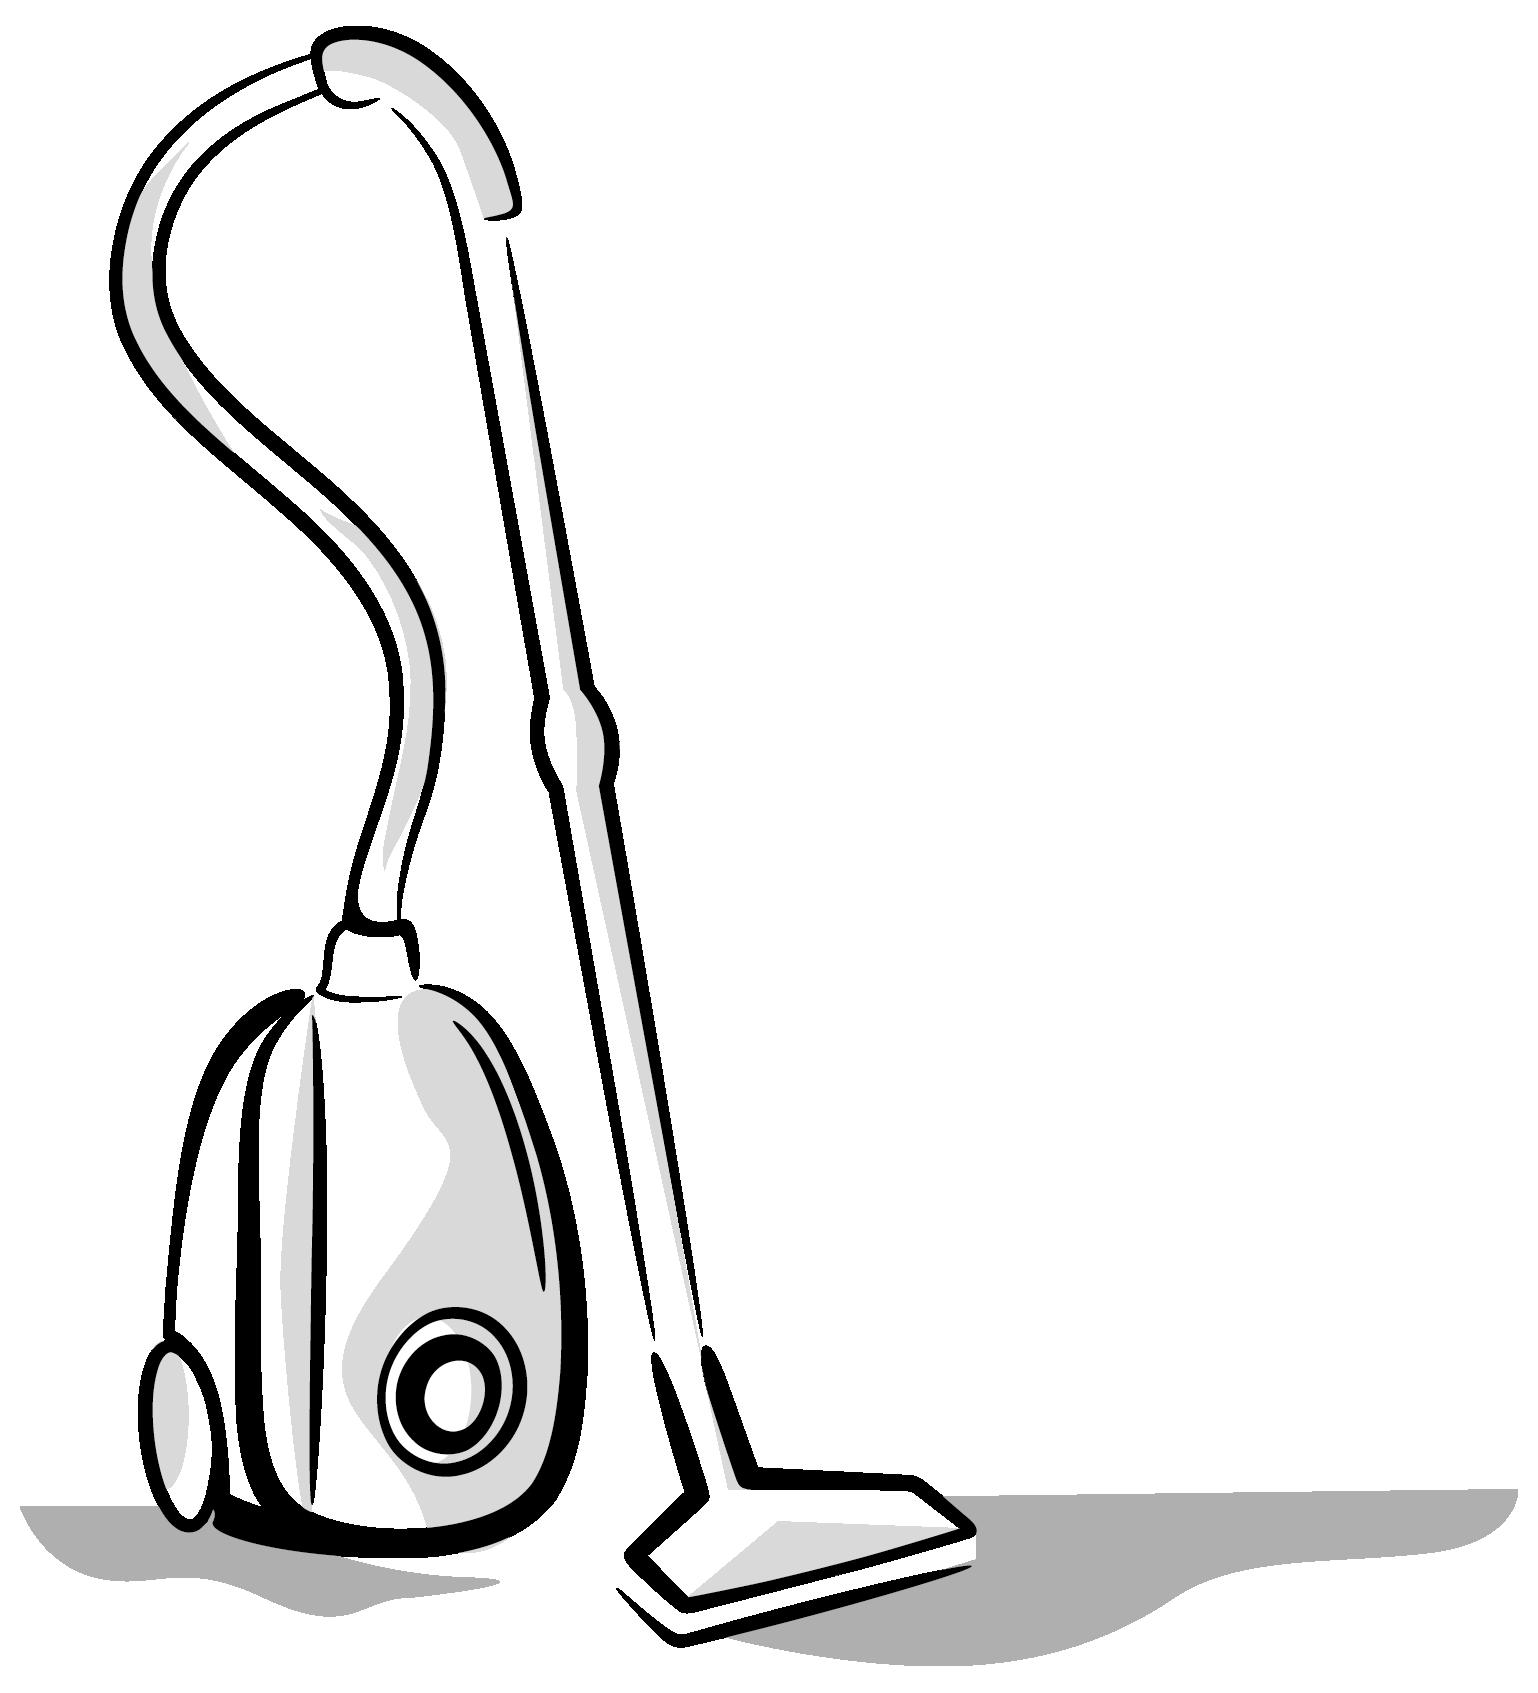 jpg free stock Vacuum Cleaner Drawing at GetDrawings